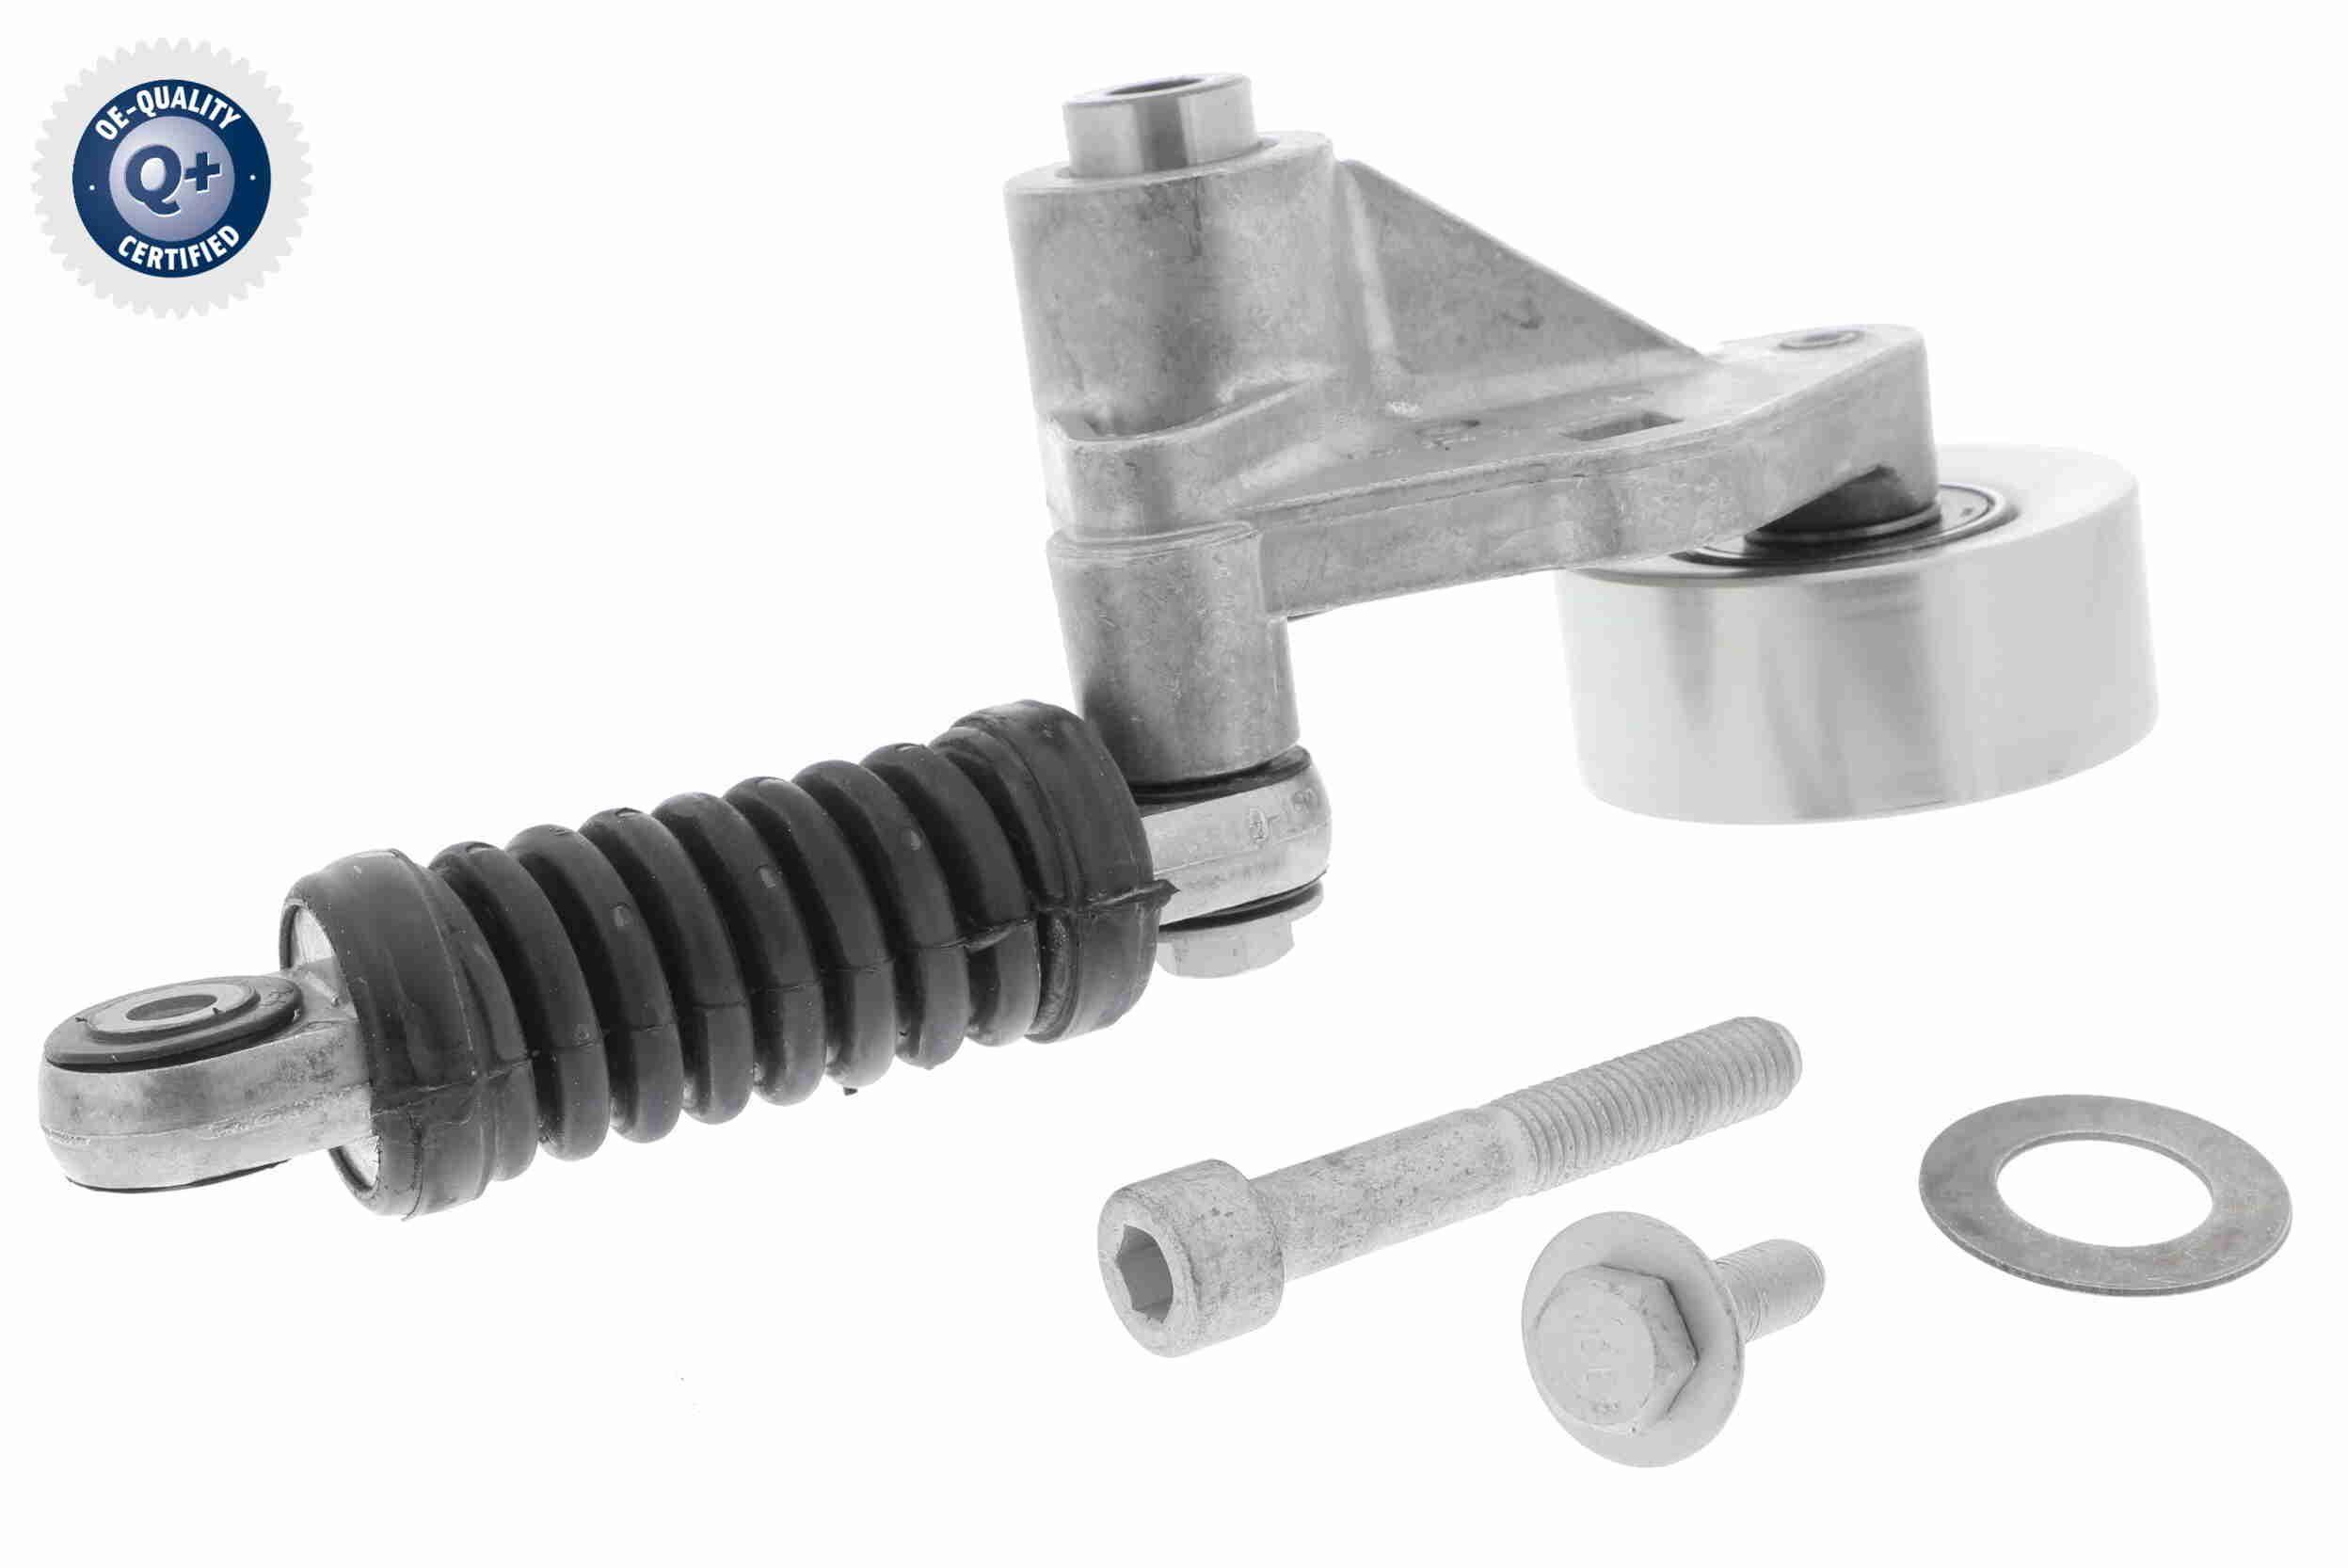 VAICO  V24-0345 Olajszűrő Ø: 53,6mm, Belső átmérő: 18,5mm, Magasság: 97,3mm, Magasság 1: 86,7mm